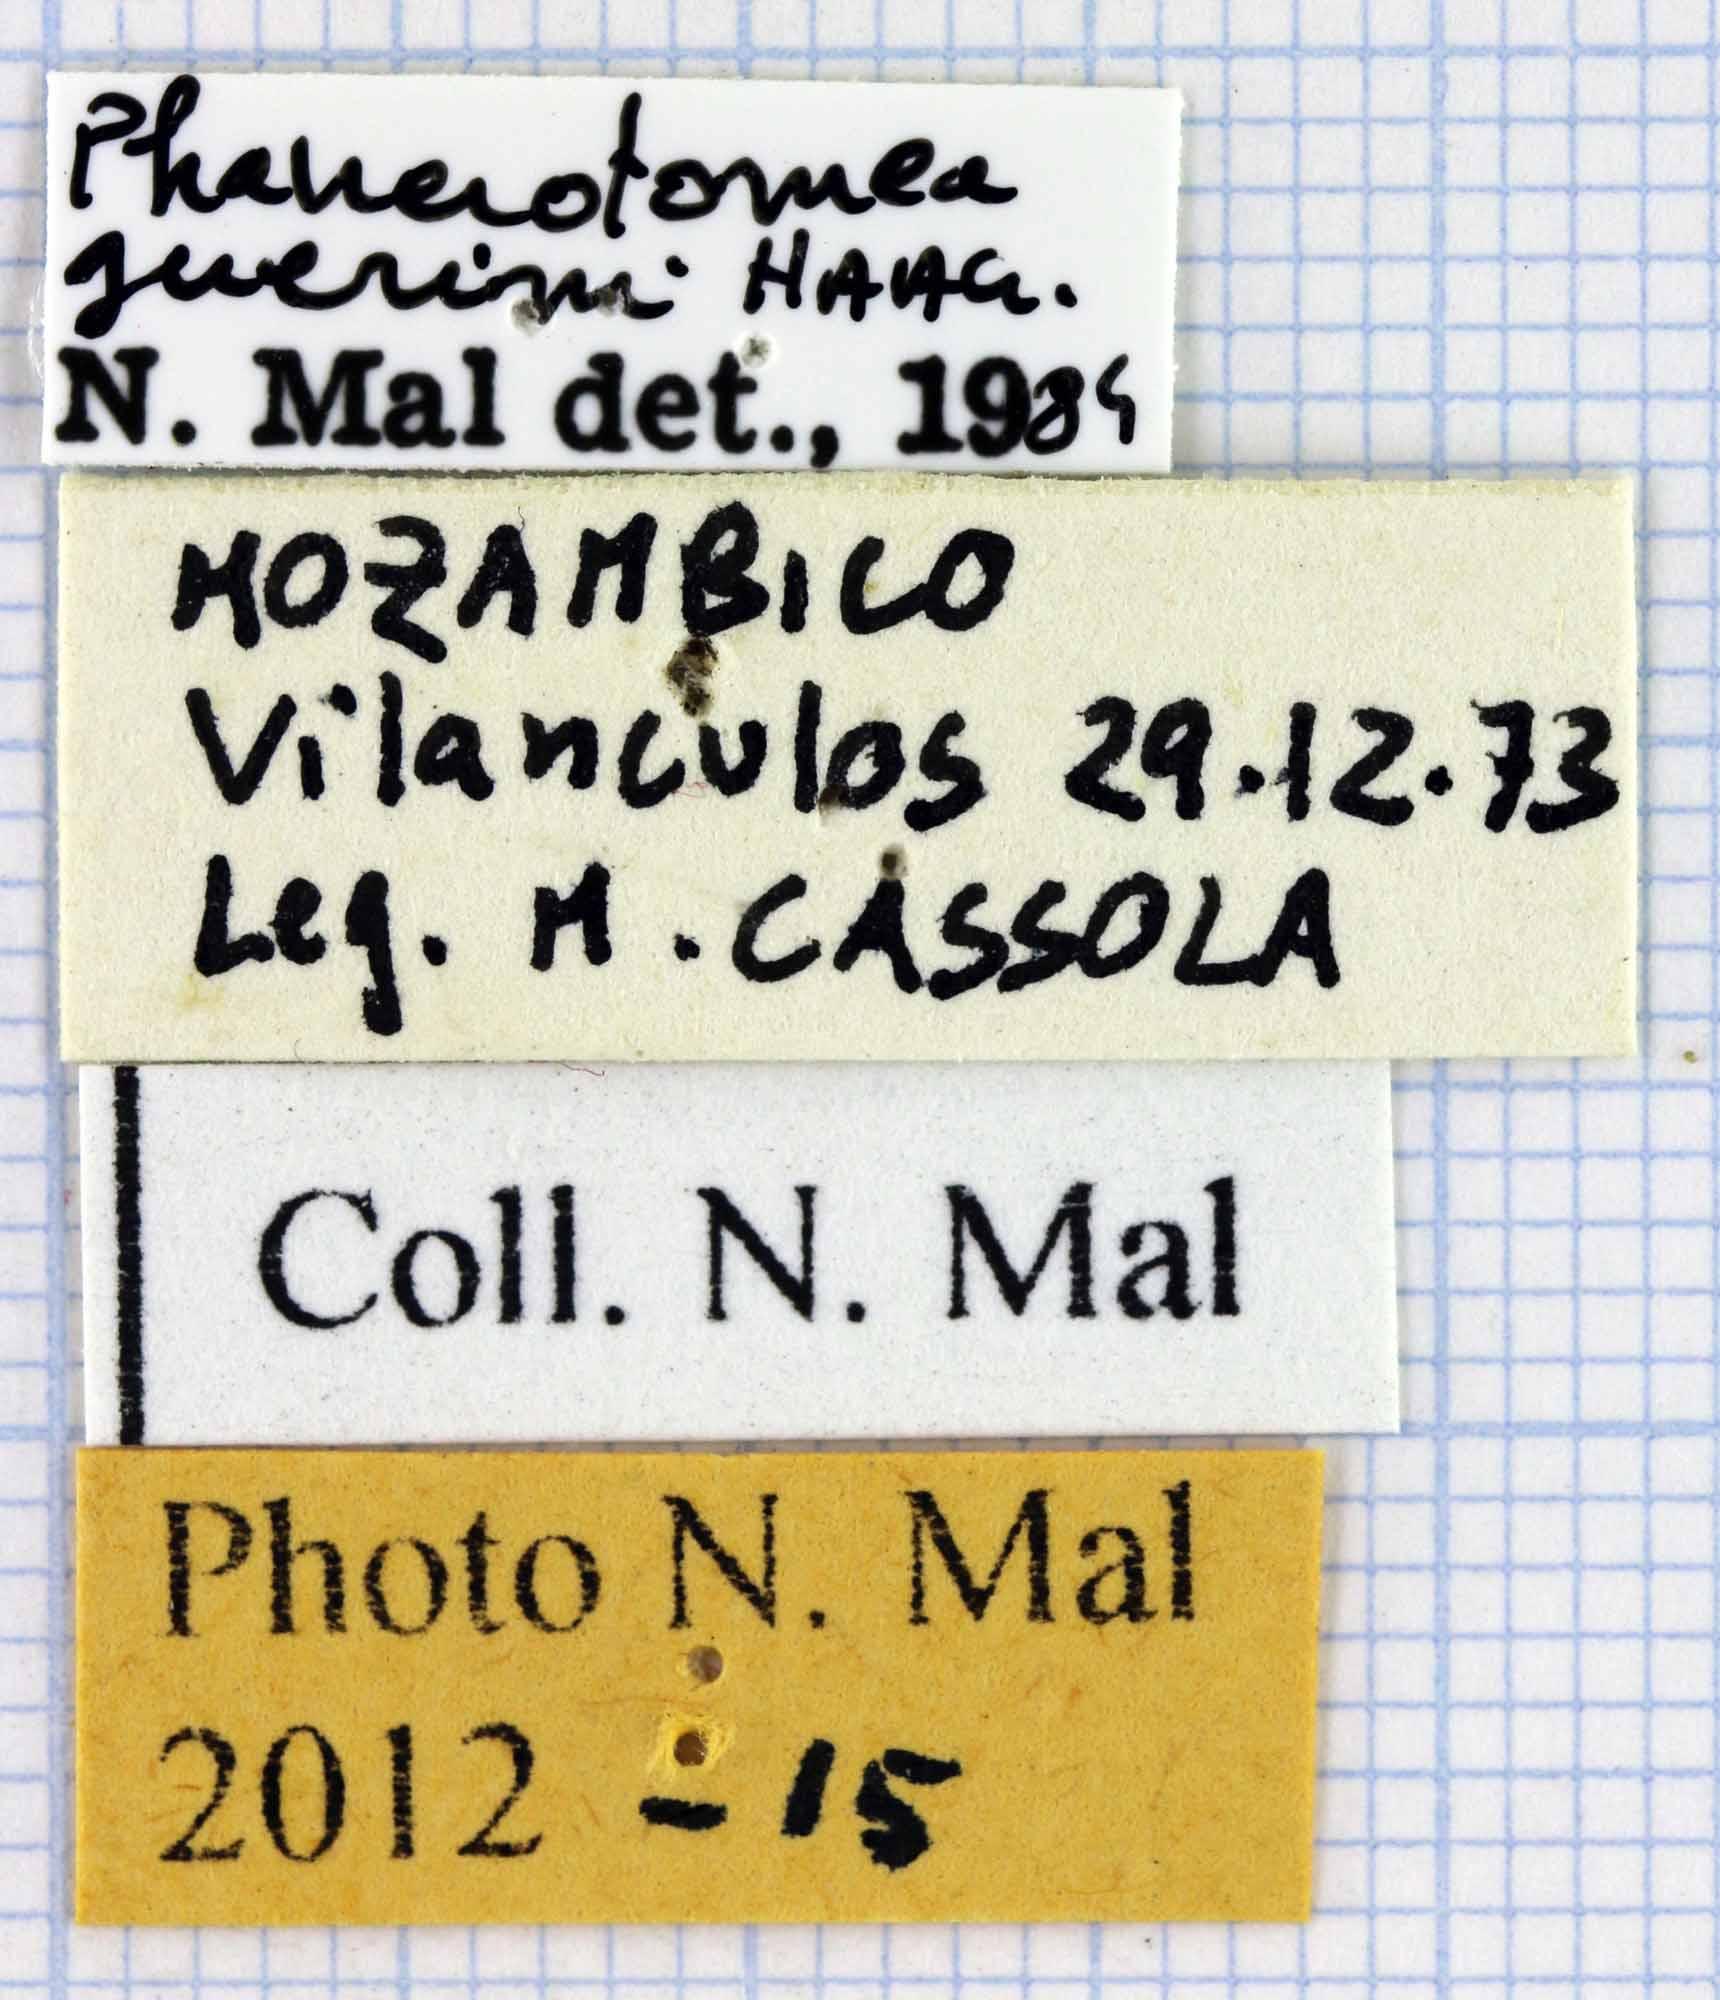 Phanerotomea guerini 35806.jpg